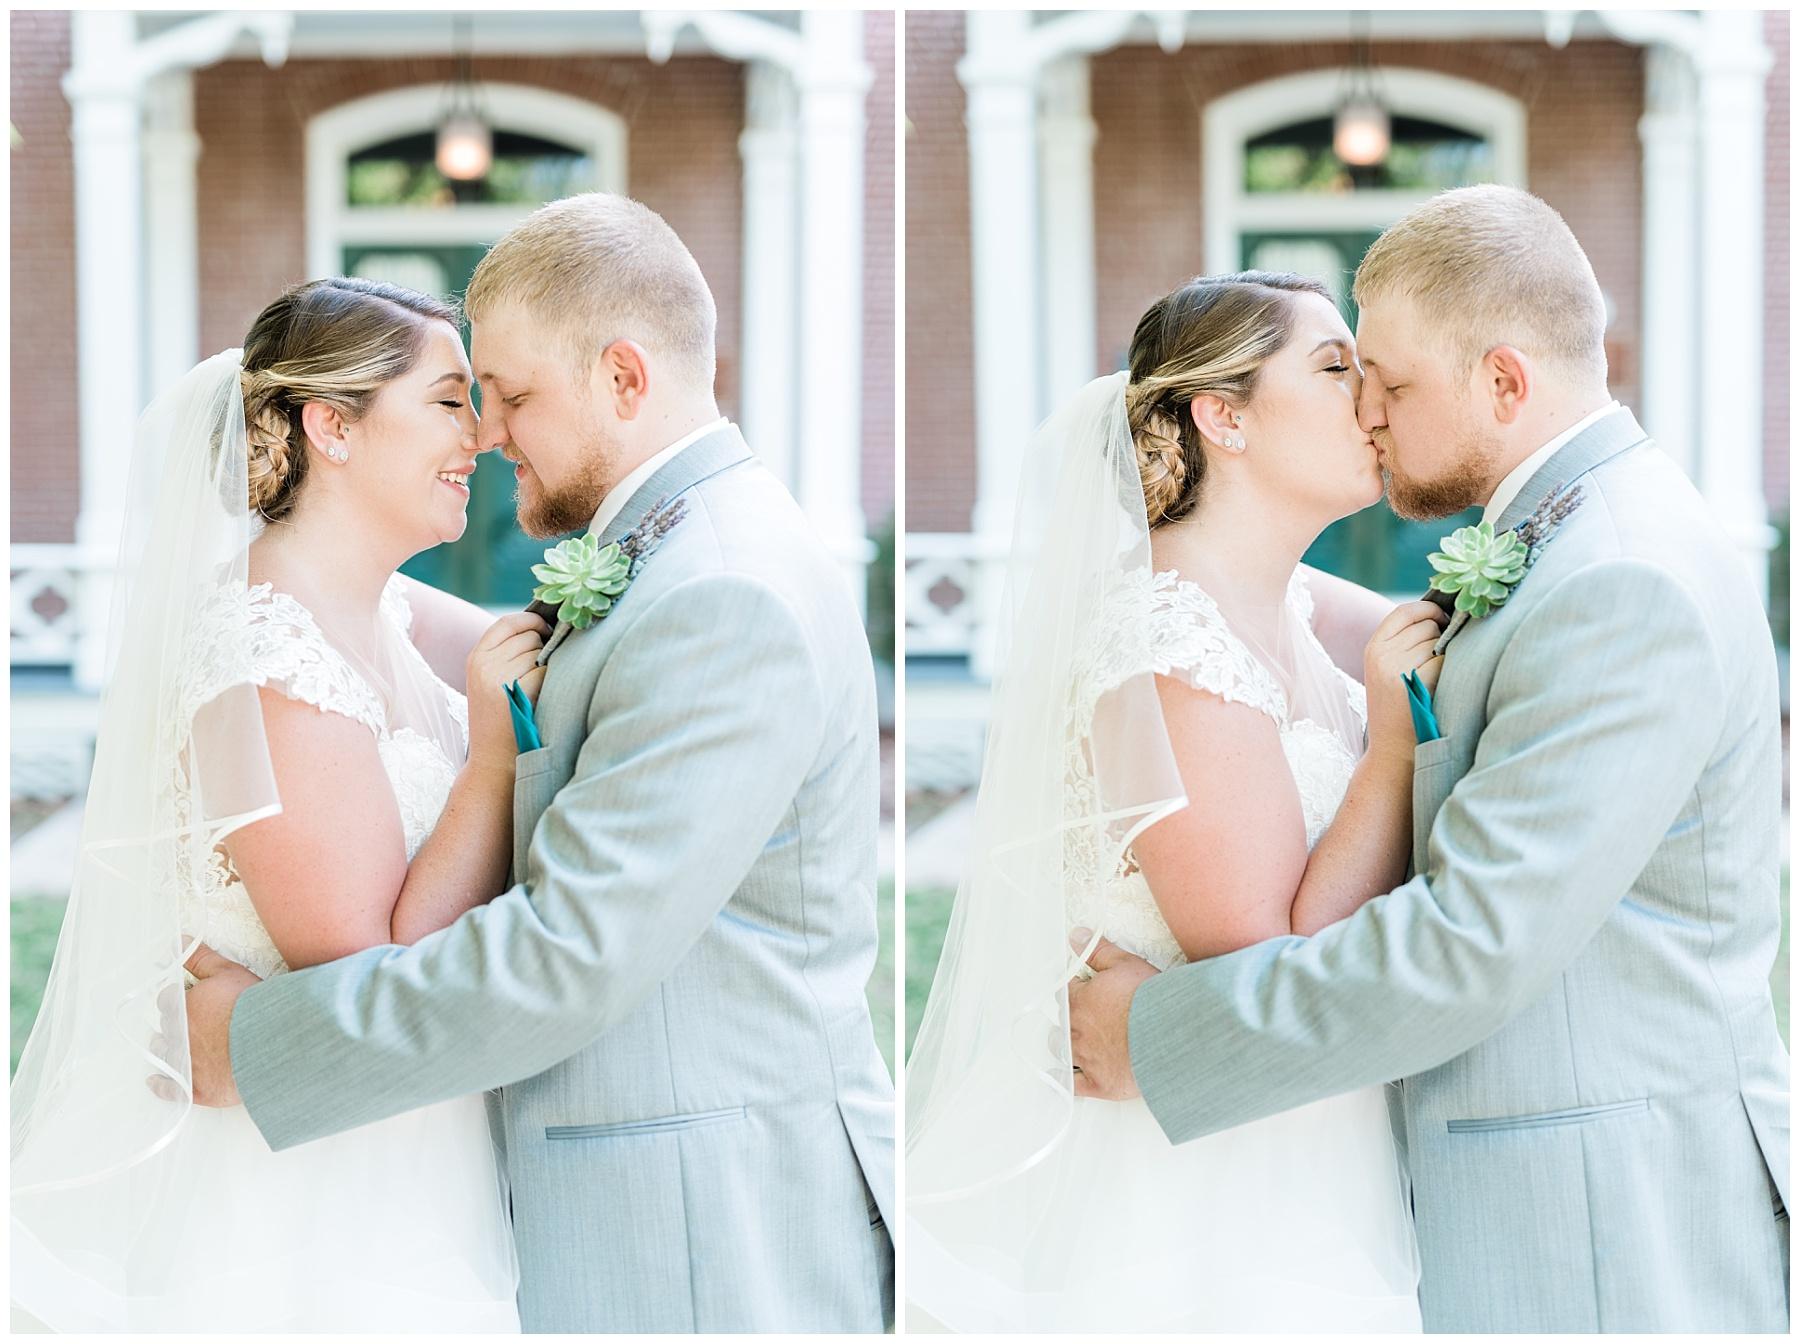 Baurichter Wedding at Stoney Creek Inn Columbia Missouri by Kelsi Kliethermes Photography_0024.jpg